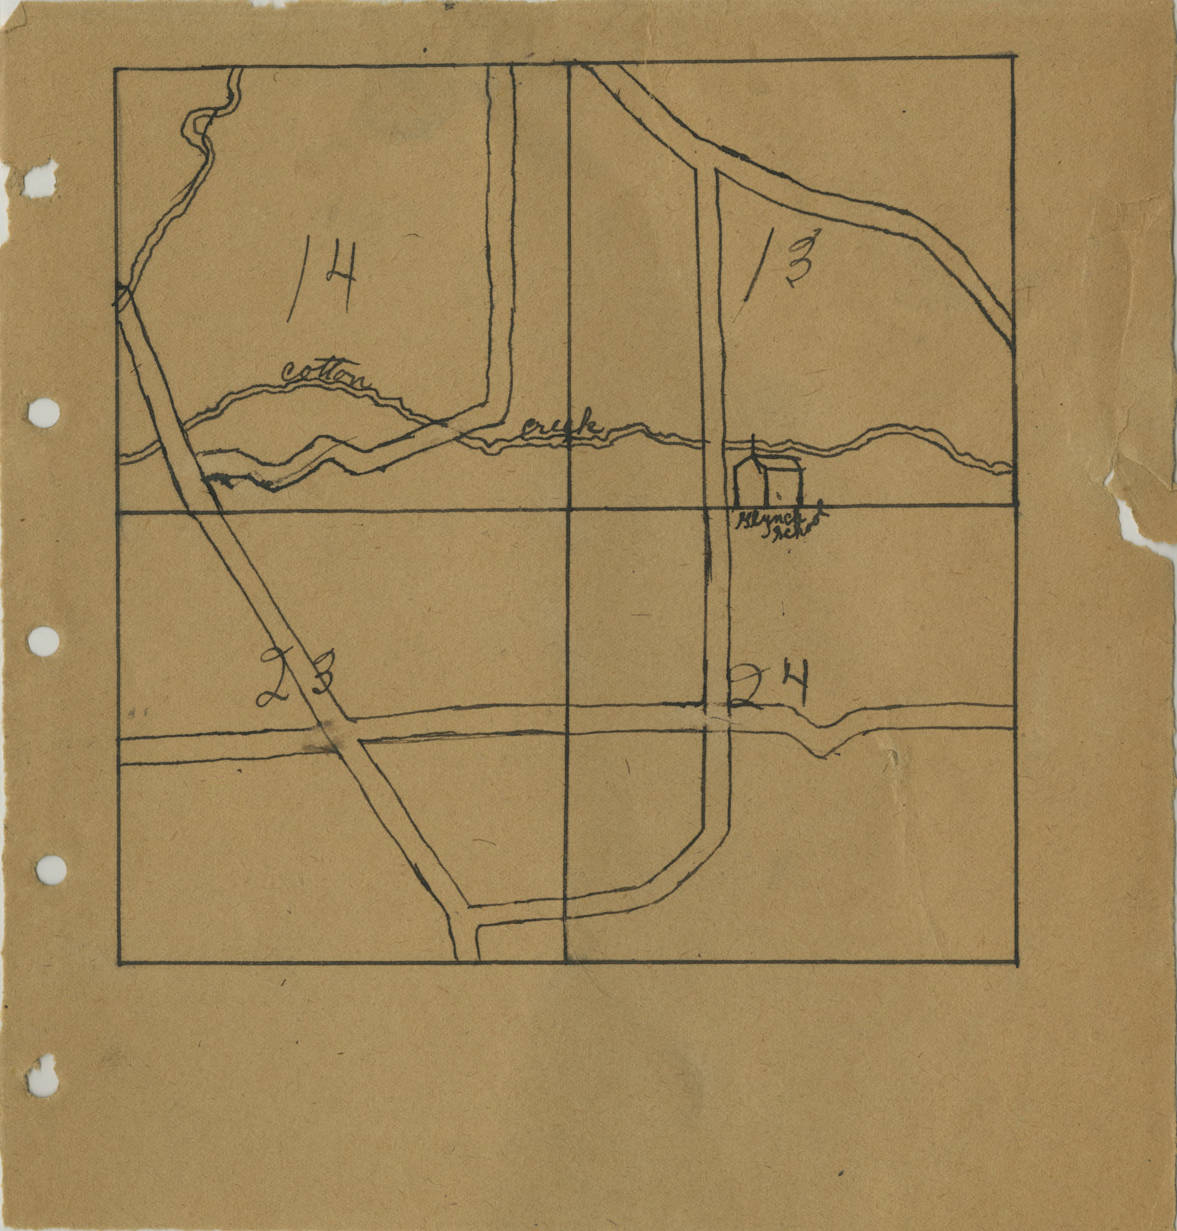 C:\Users\Vern\Documents\Fort Hill\1918 Schools Centennial\1918 Wauconda Twp Glynch School\1918_School_Histories__Wauconda_Township__Glynch_School_2003045_Page_18.jpg